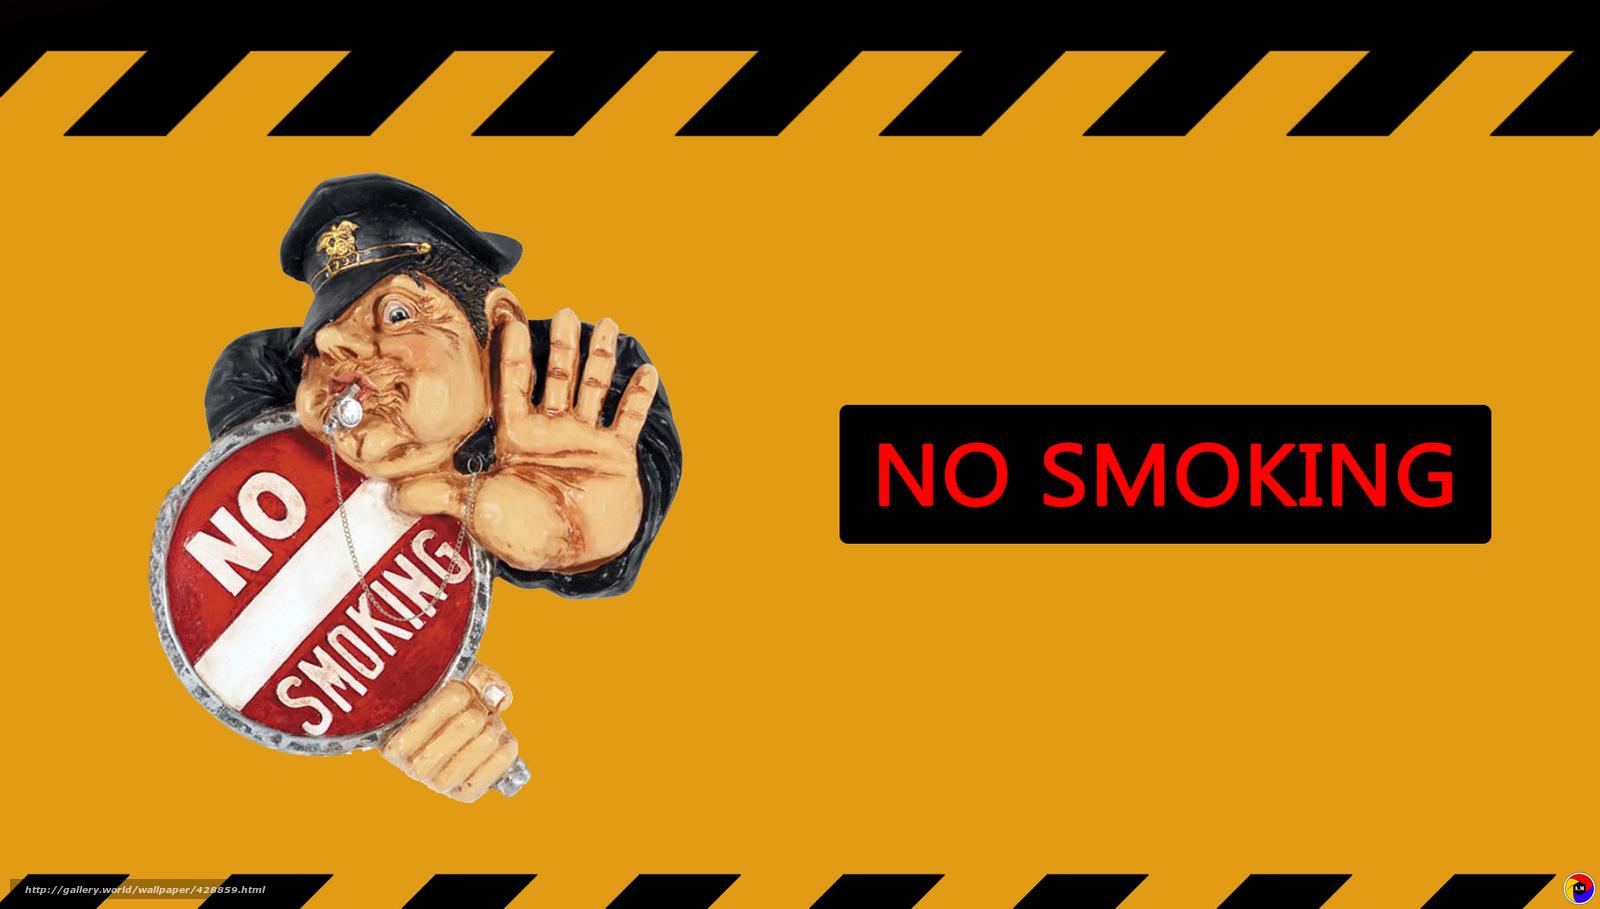 Download wallpaper no smoking no news yelow 1600x909